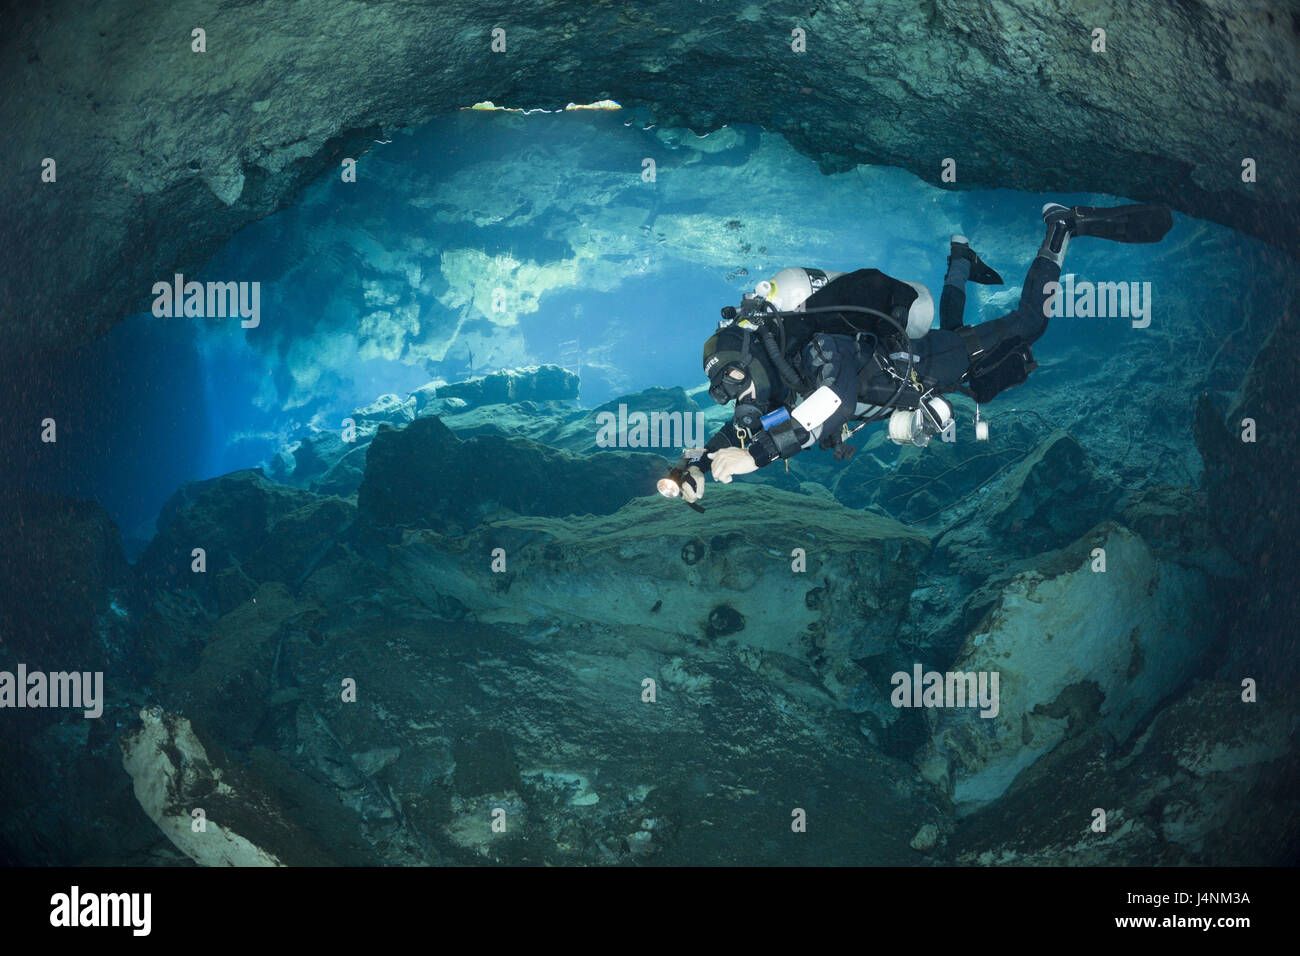 Diving in the Cenote' Chac Mool', Playa del Carmen, Yucatan peninsula, Mexico, - Stock Image